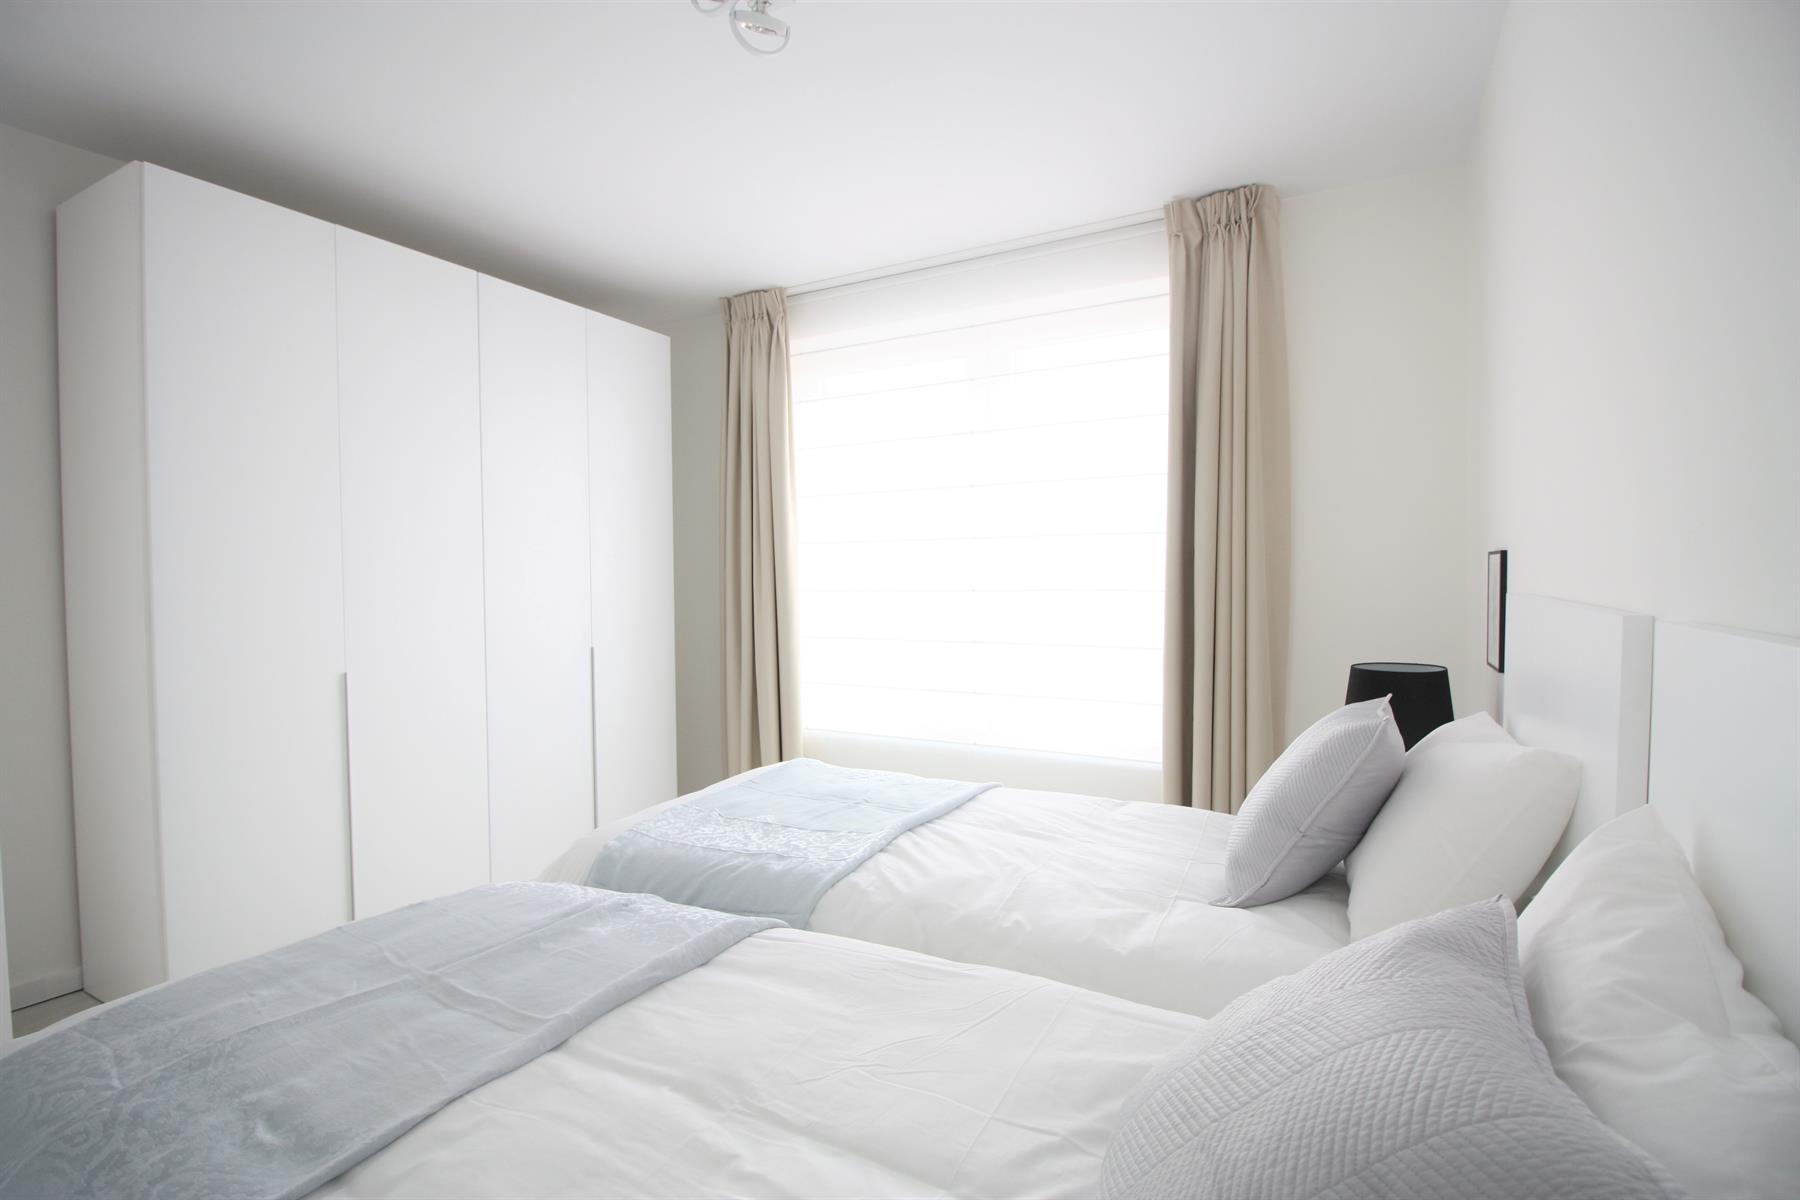 Appartement - Woluwe-Saint-Lambert - #4092446-10